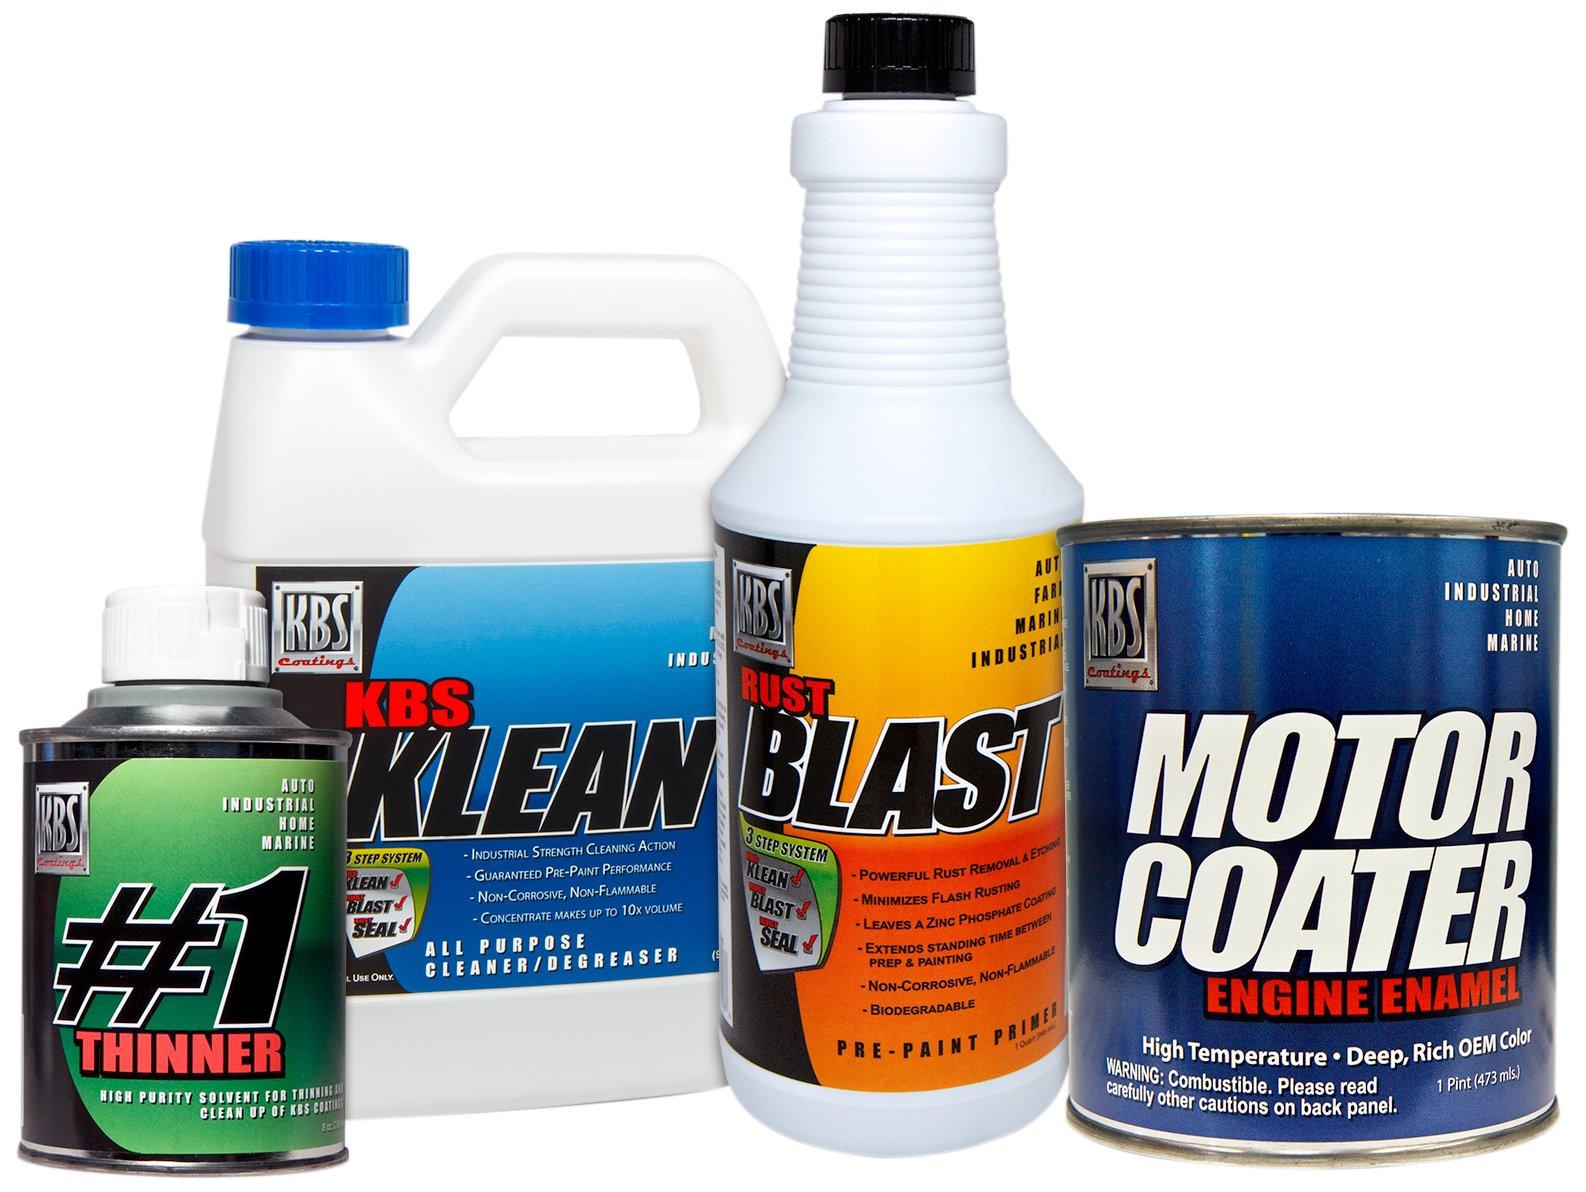 KBS Coatings 58028 Chevy Grey Motor Coater Engine Paint Kit